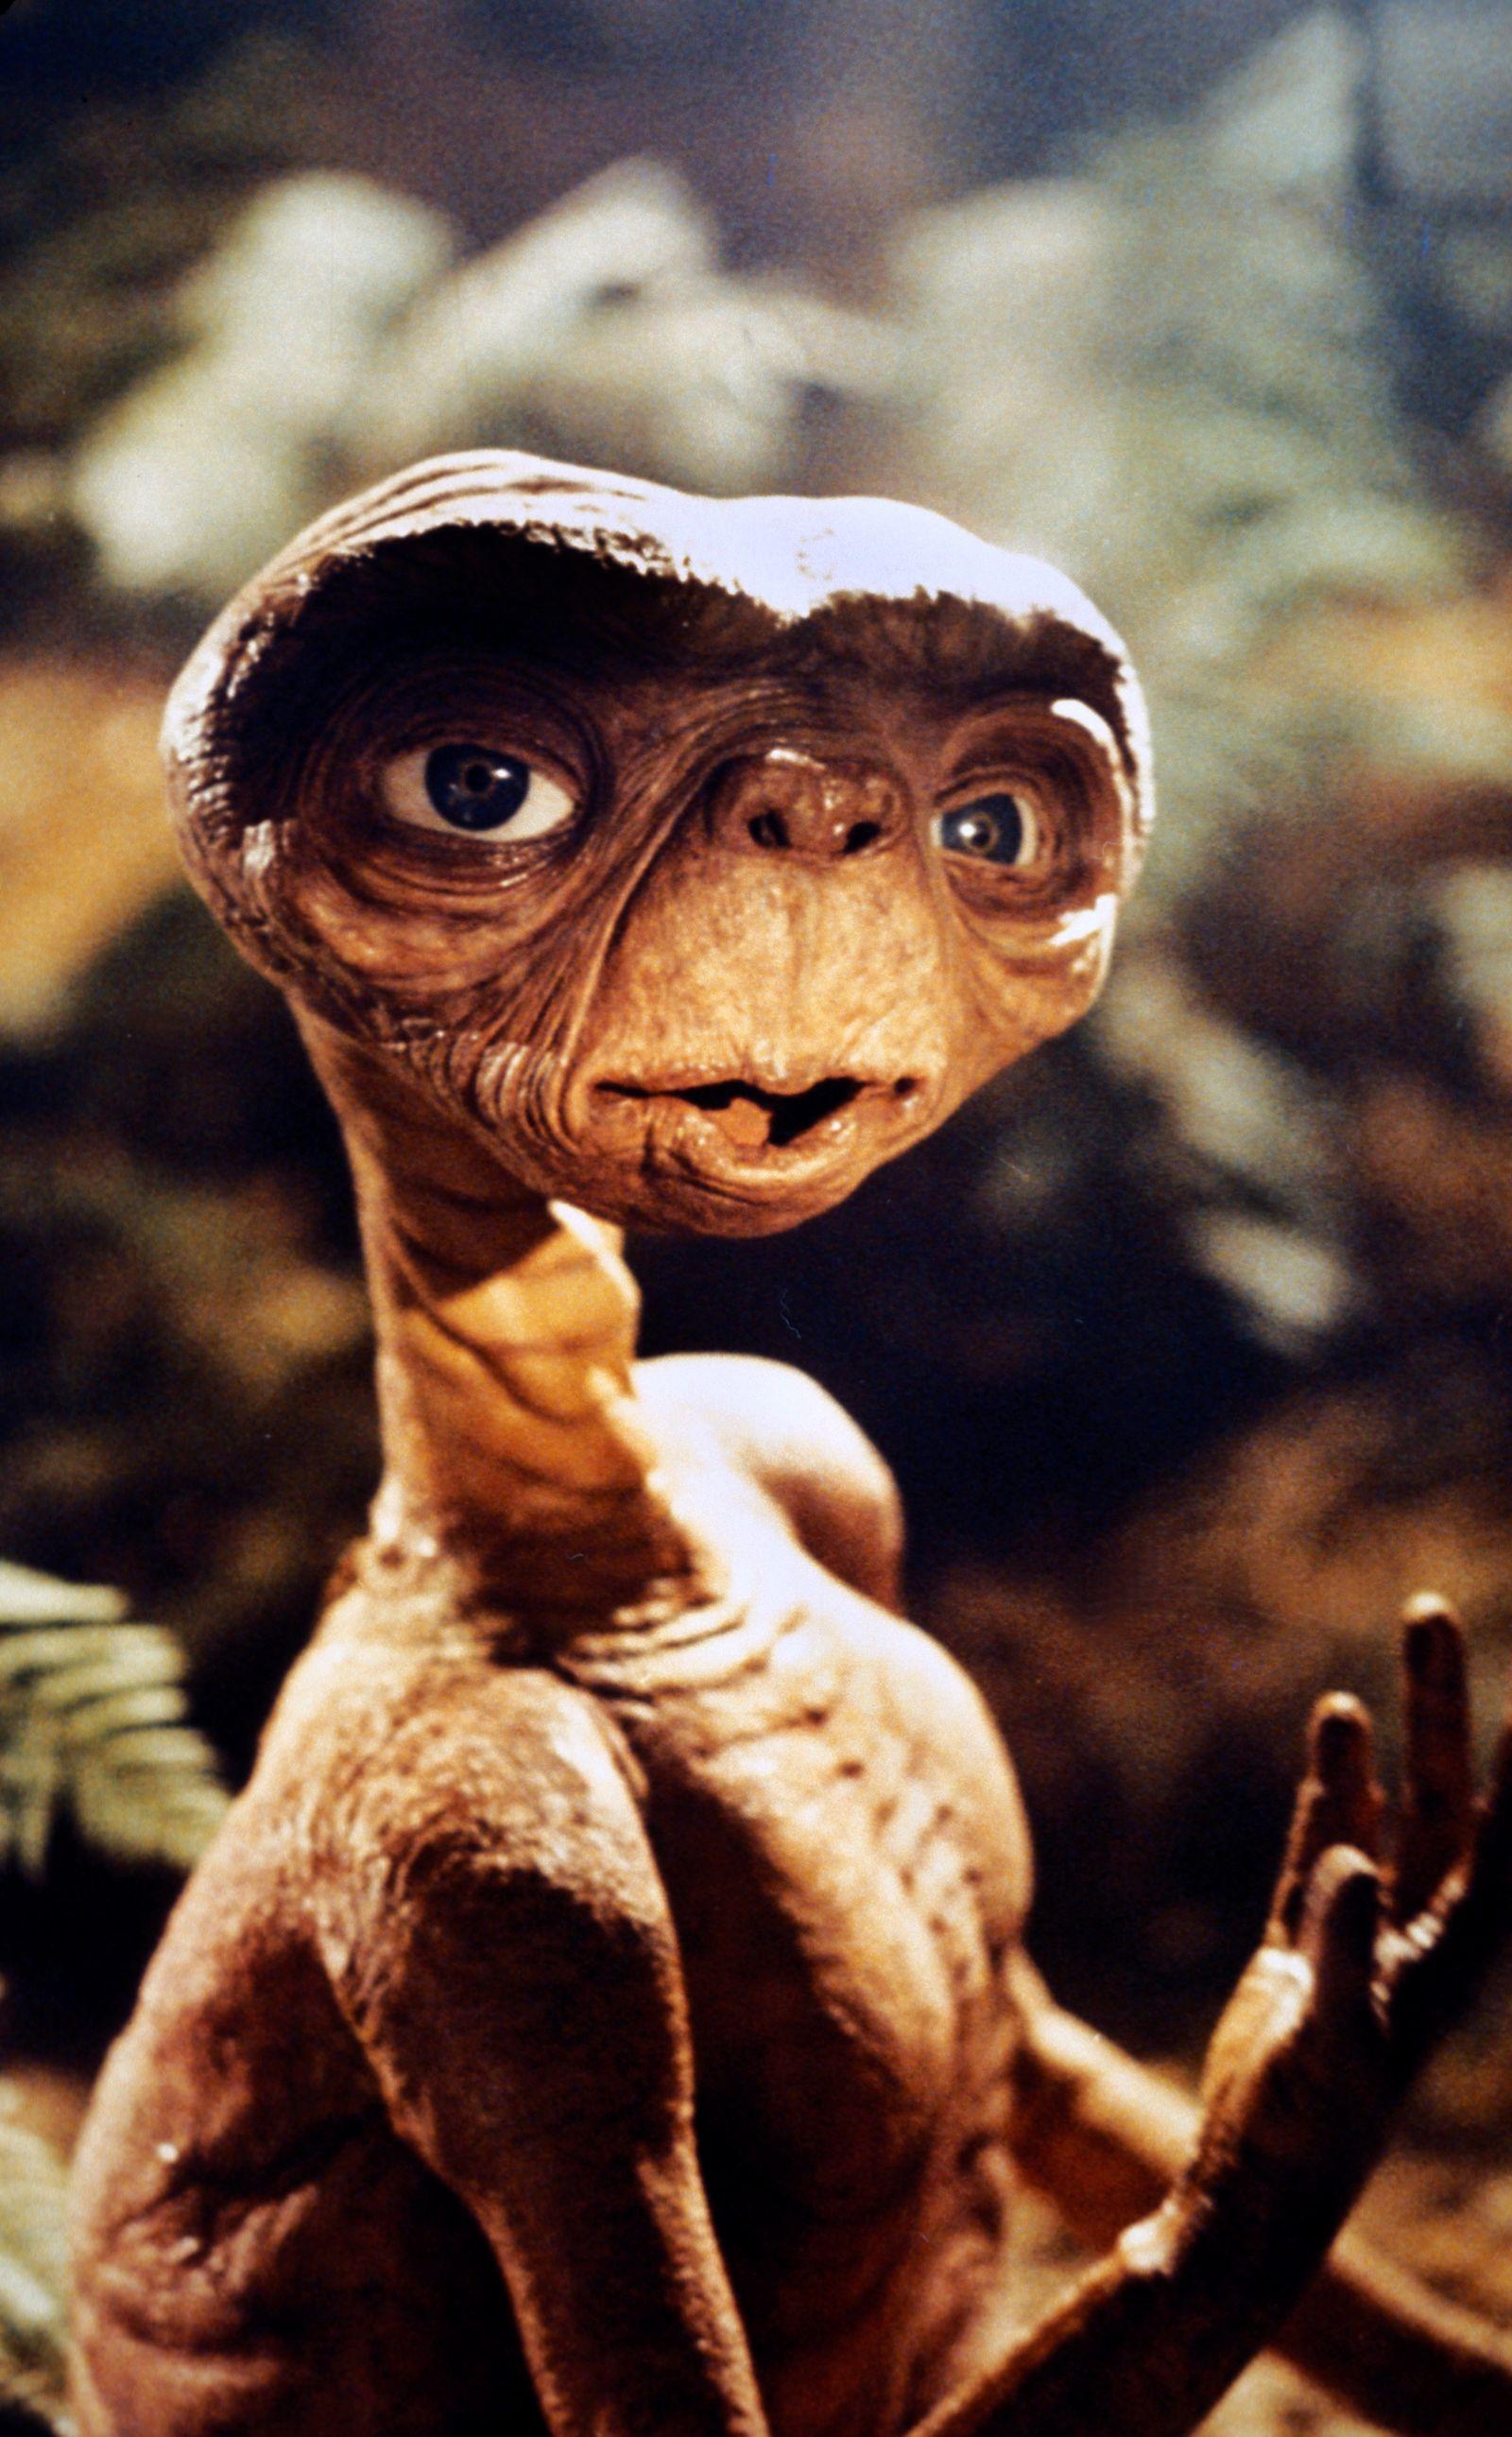 """E.T.: The Extra-Terrestrial"" E.T. 1982 Universal ** I.V."